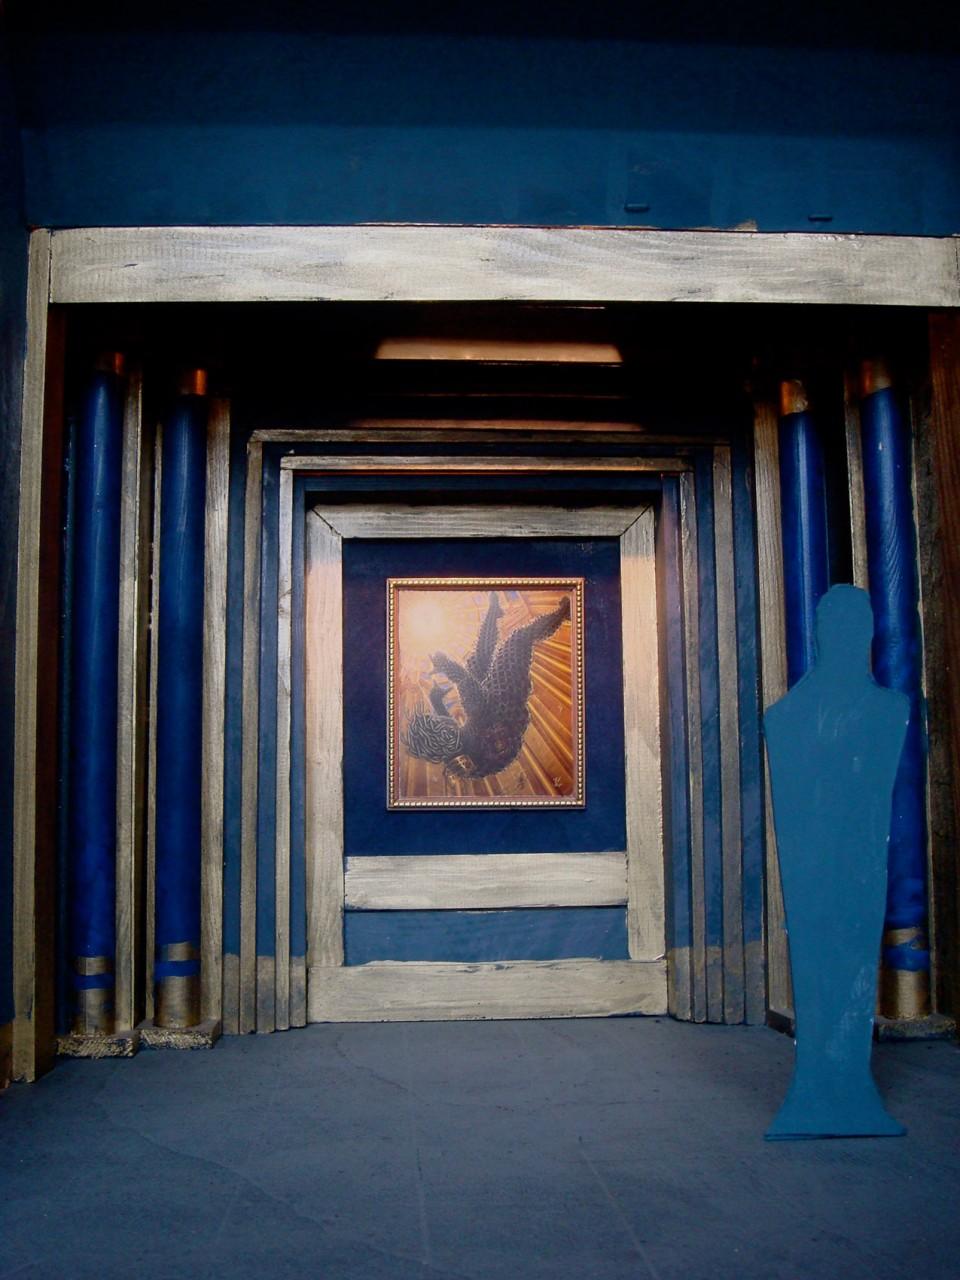 Modell Museum der Phantastik Konche